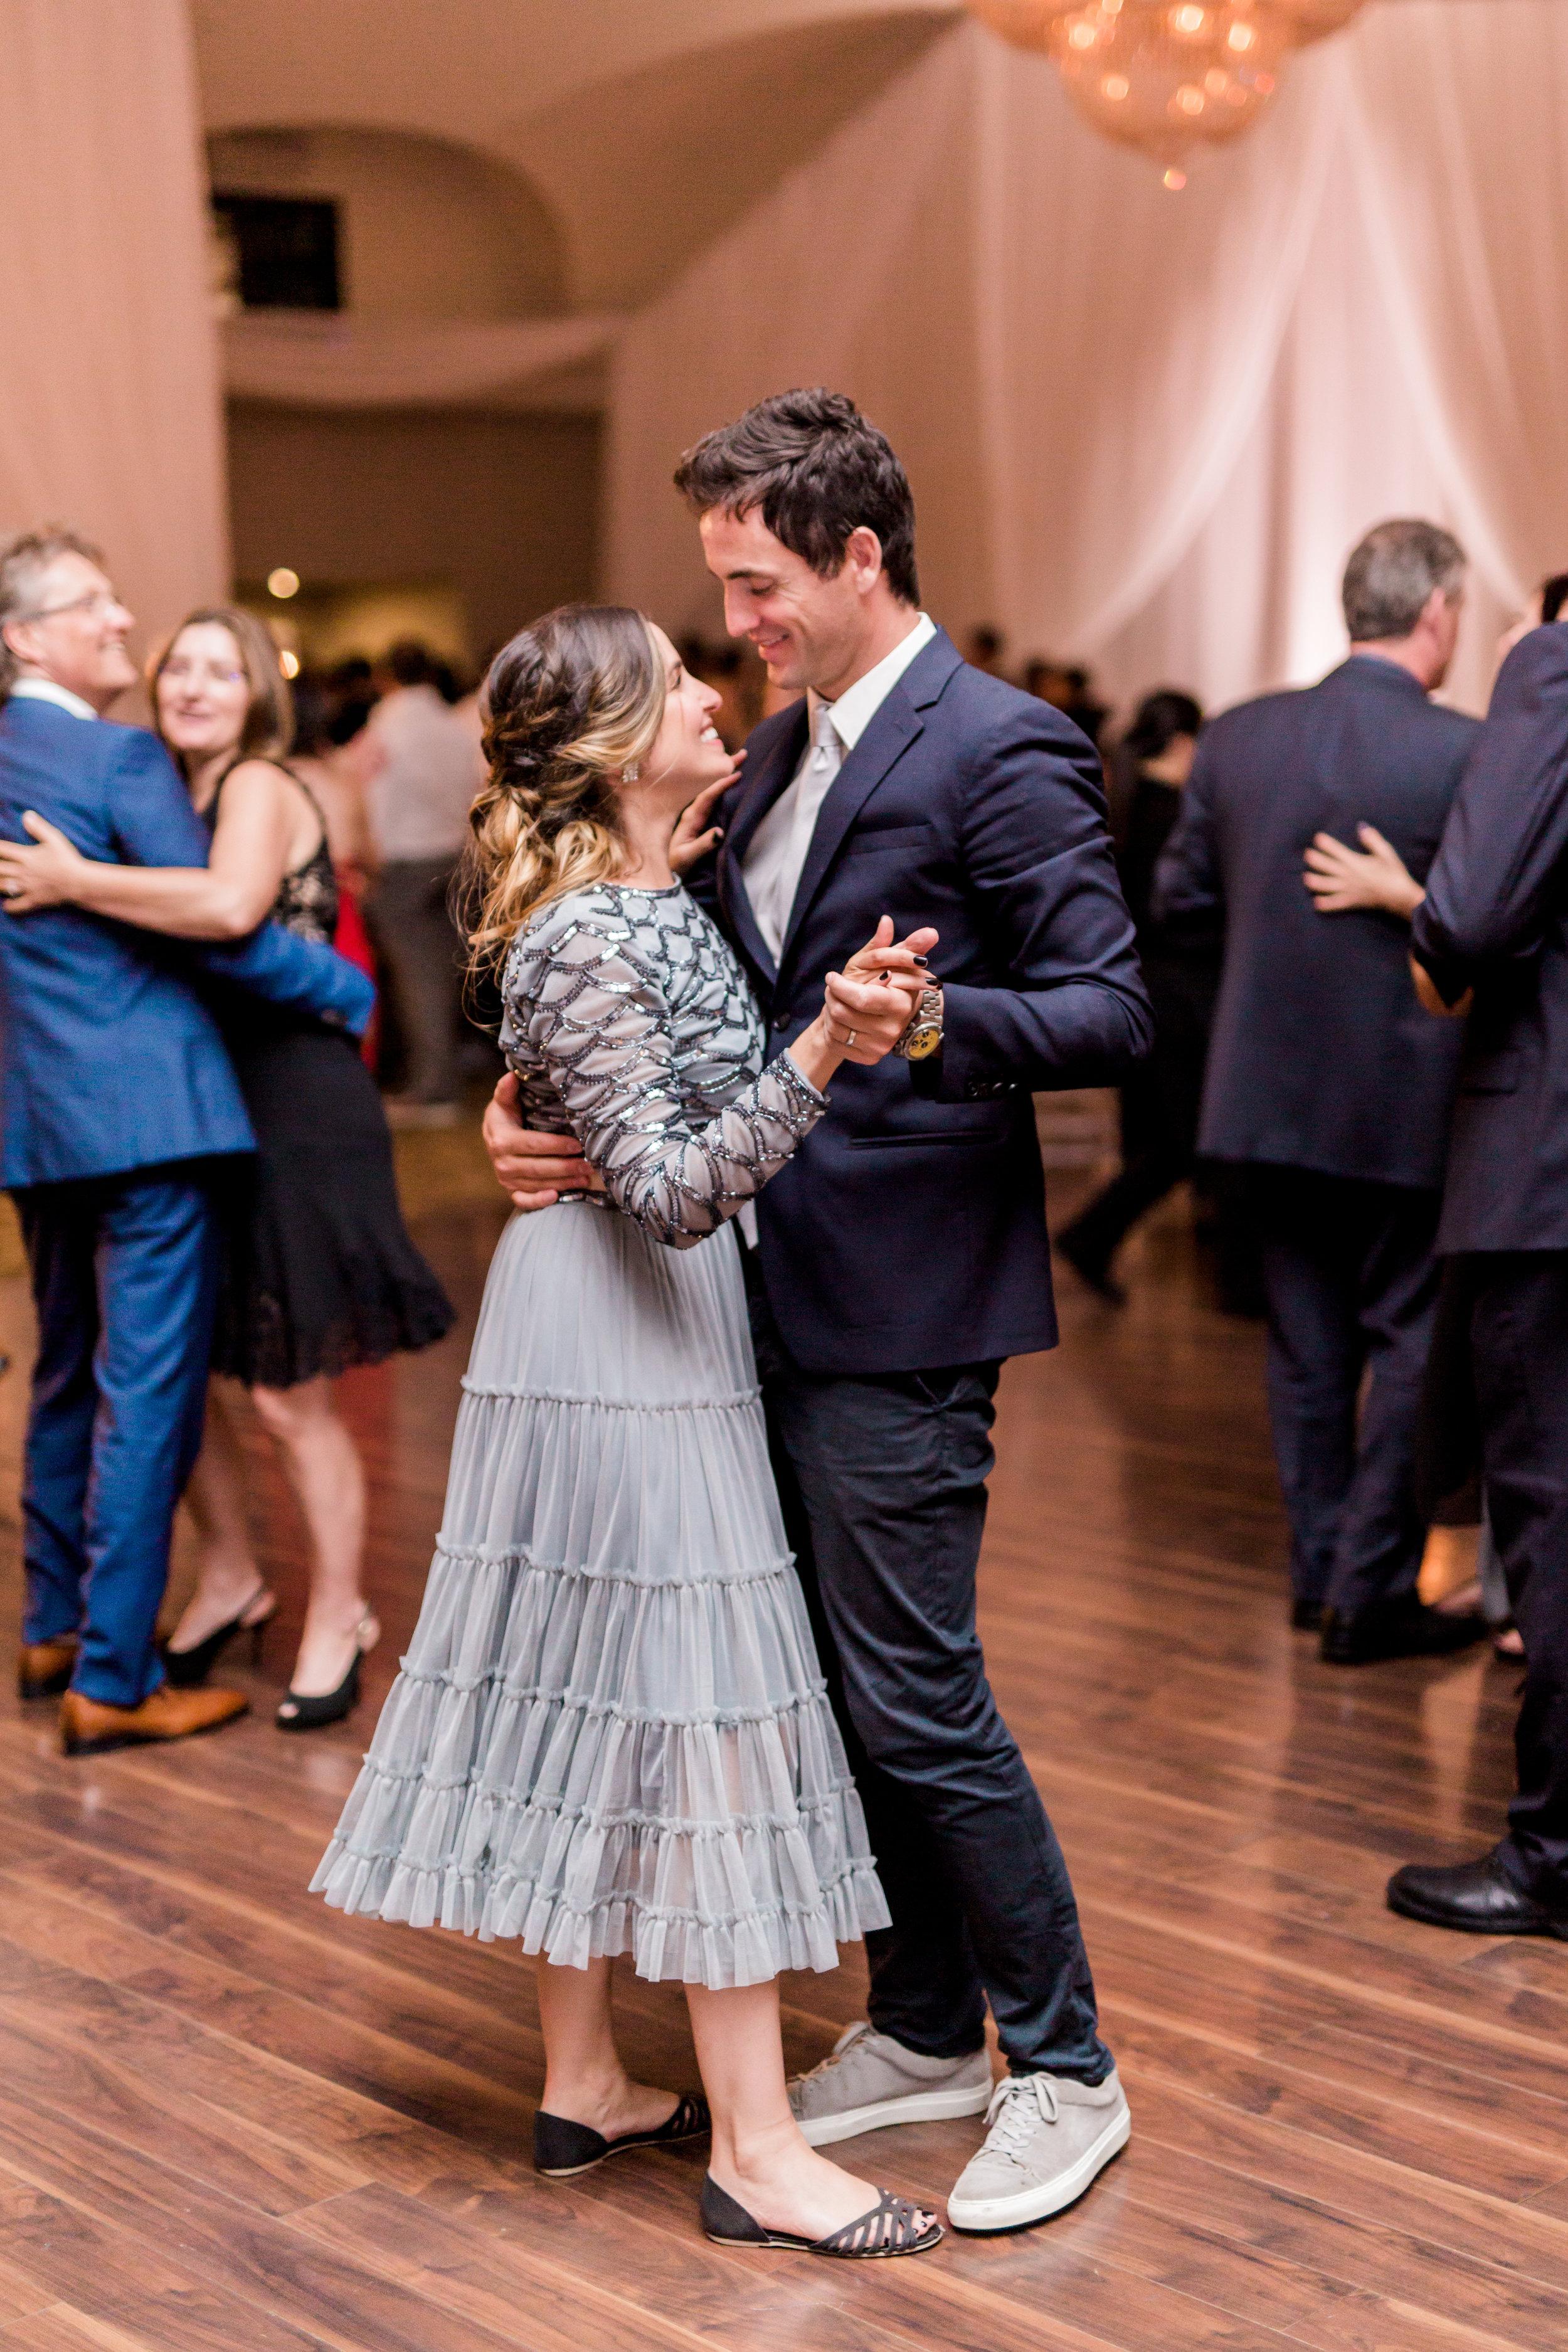 Danielle-Giroux-Amir-Golbazi-Toronto-Wedding-Photographer-Bellvue-Manor_DeLuca_2-834.jpg